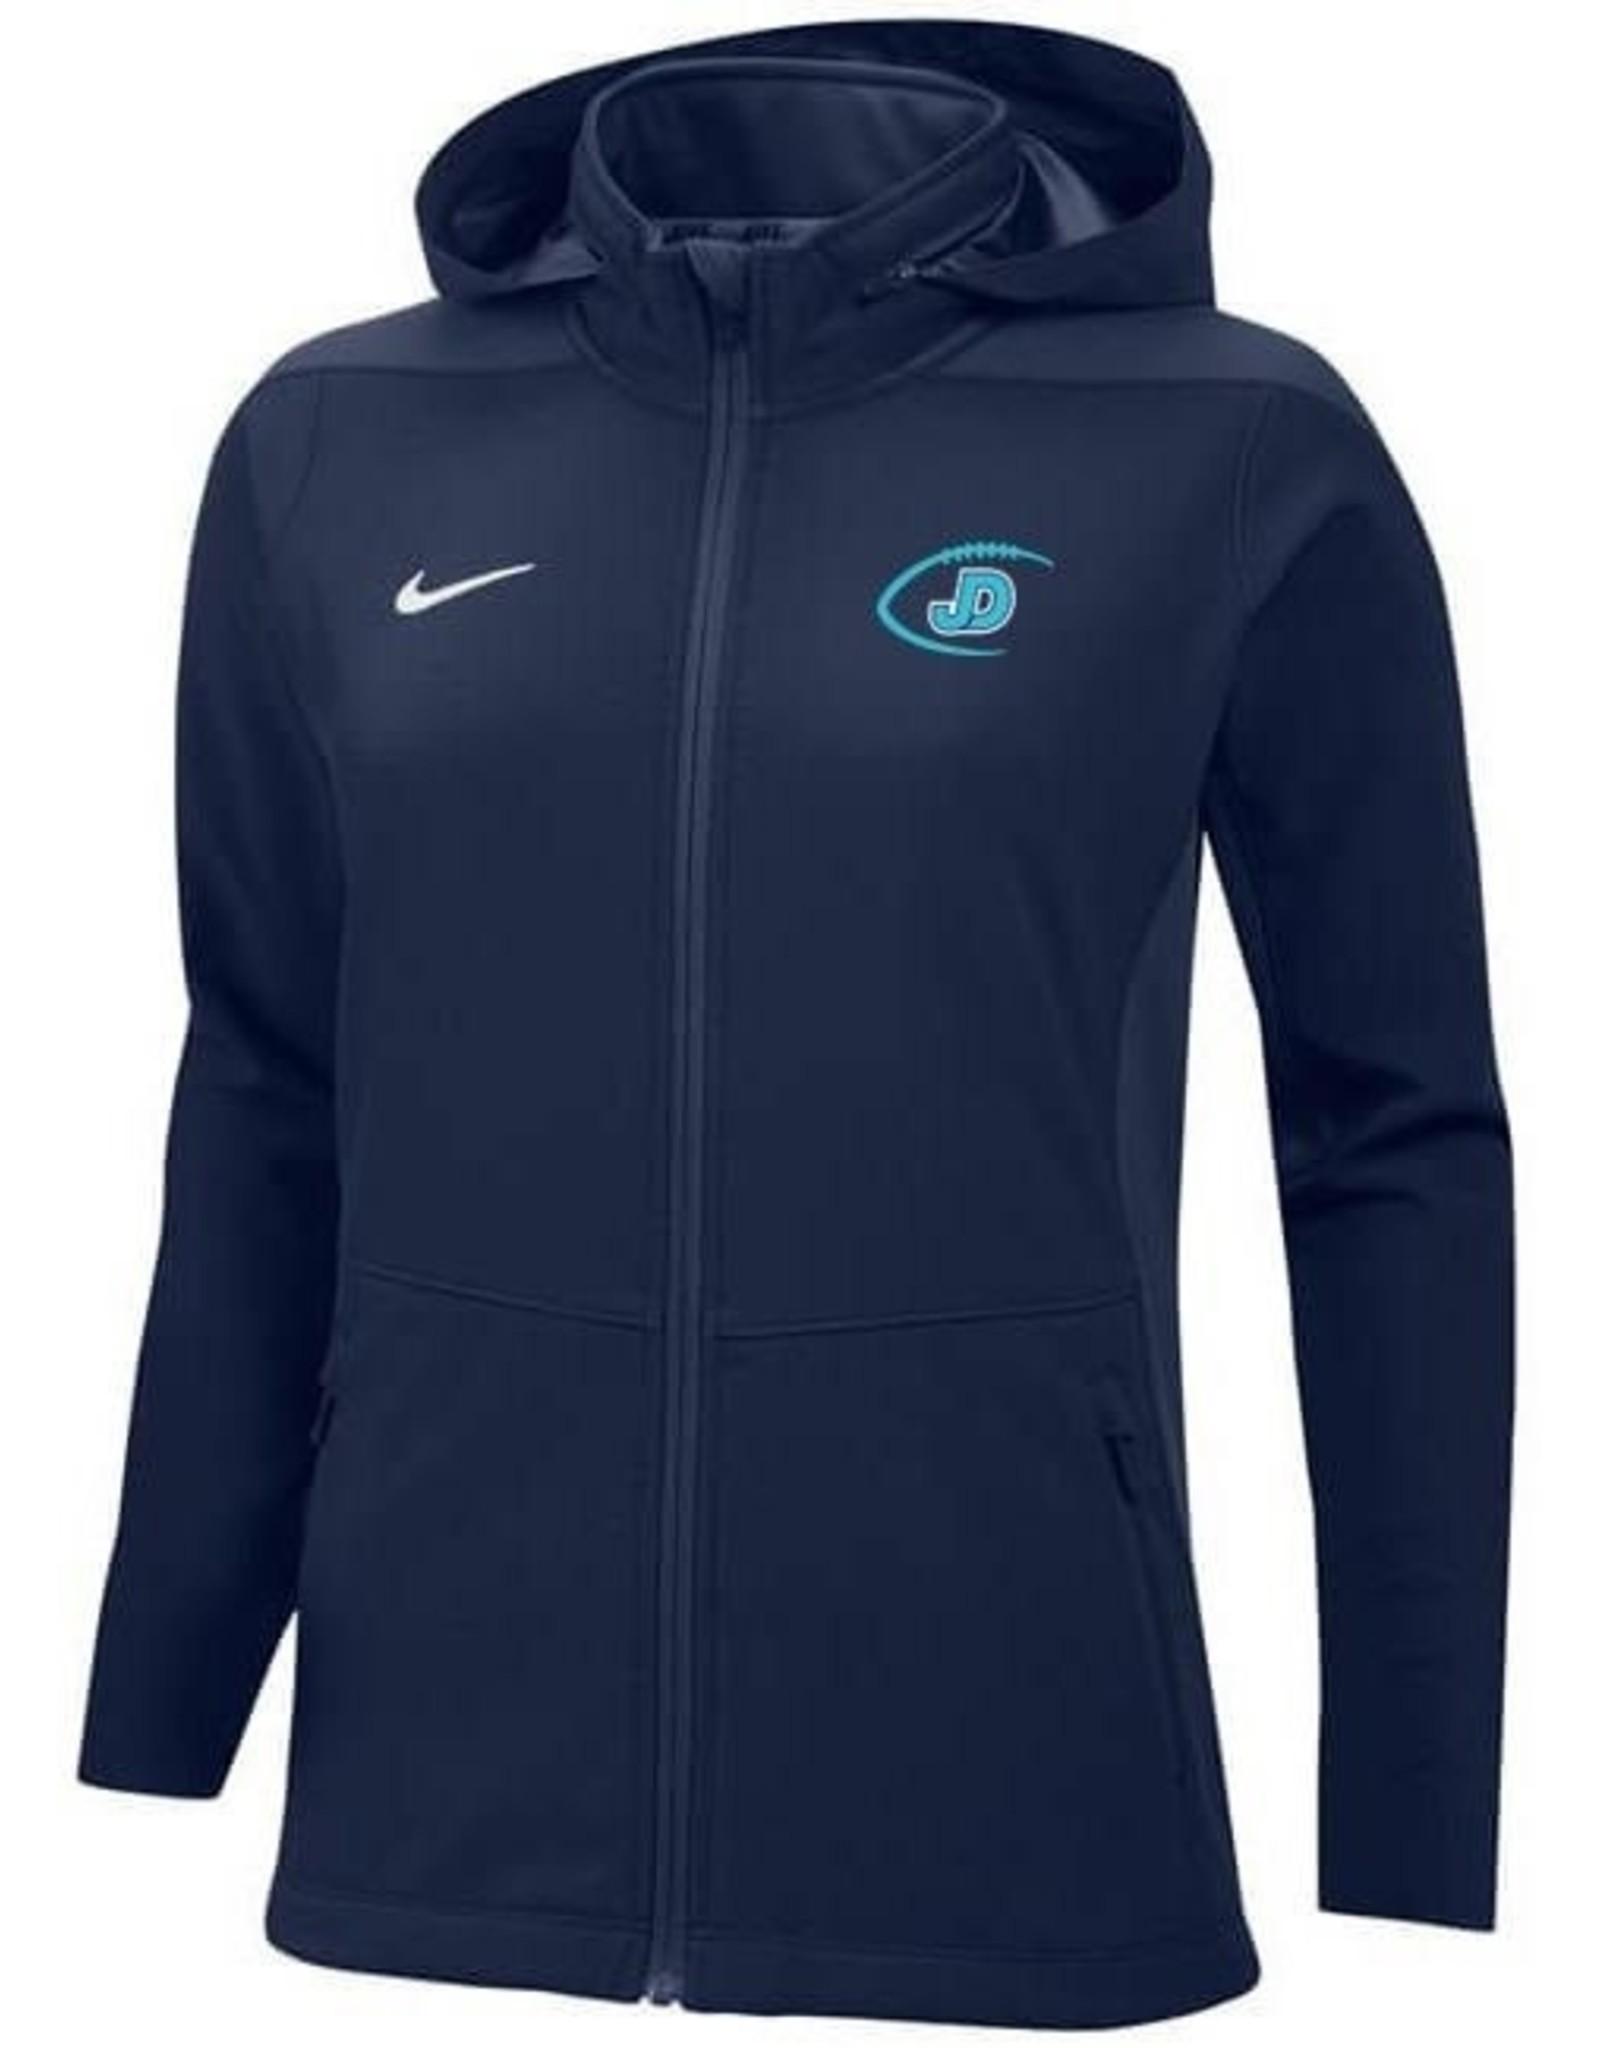 NON-UNIFORM JD Nike Sphere Hybrid Jacket, Ladies, Custom